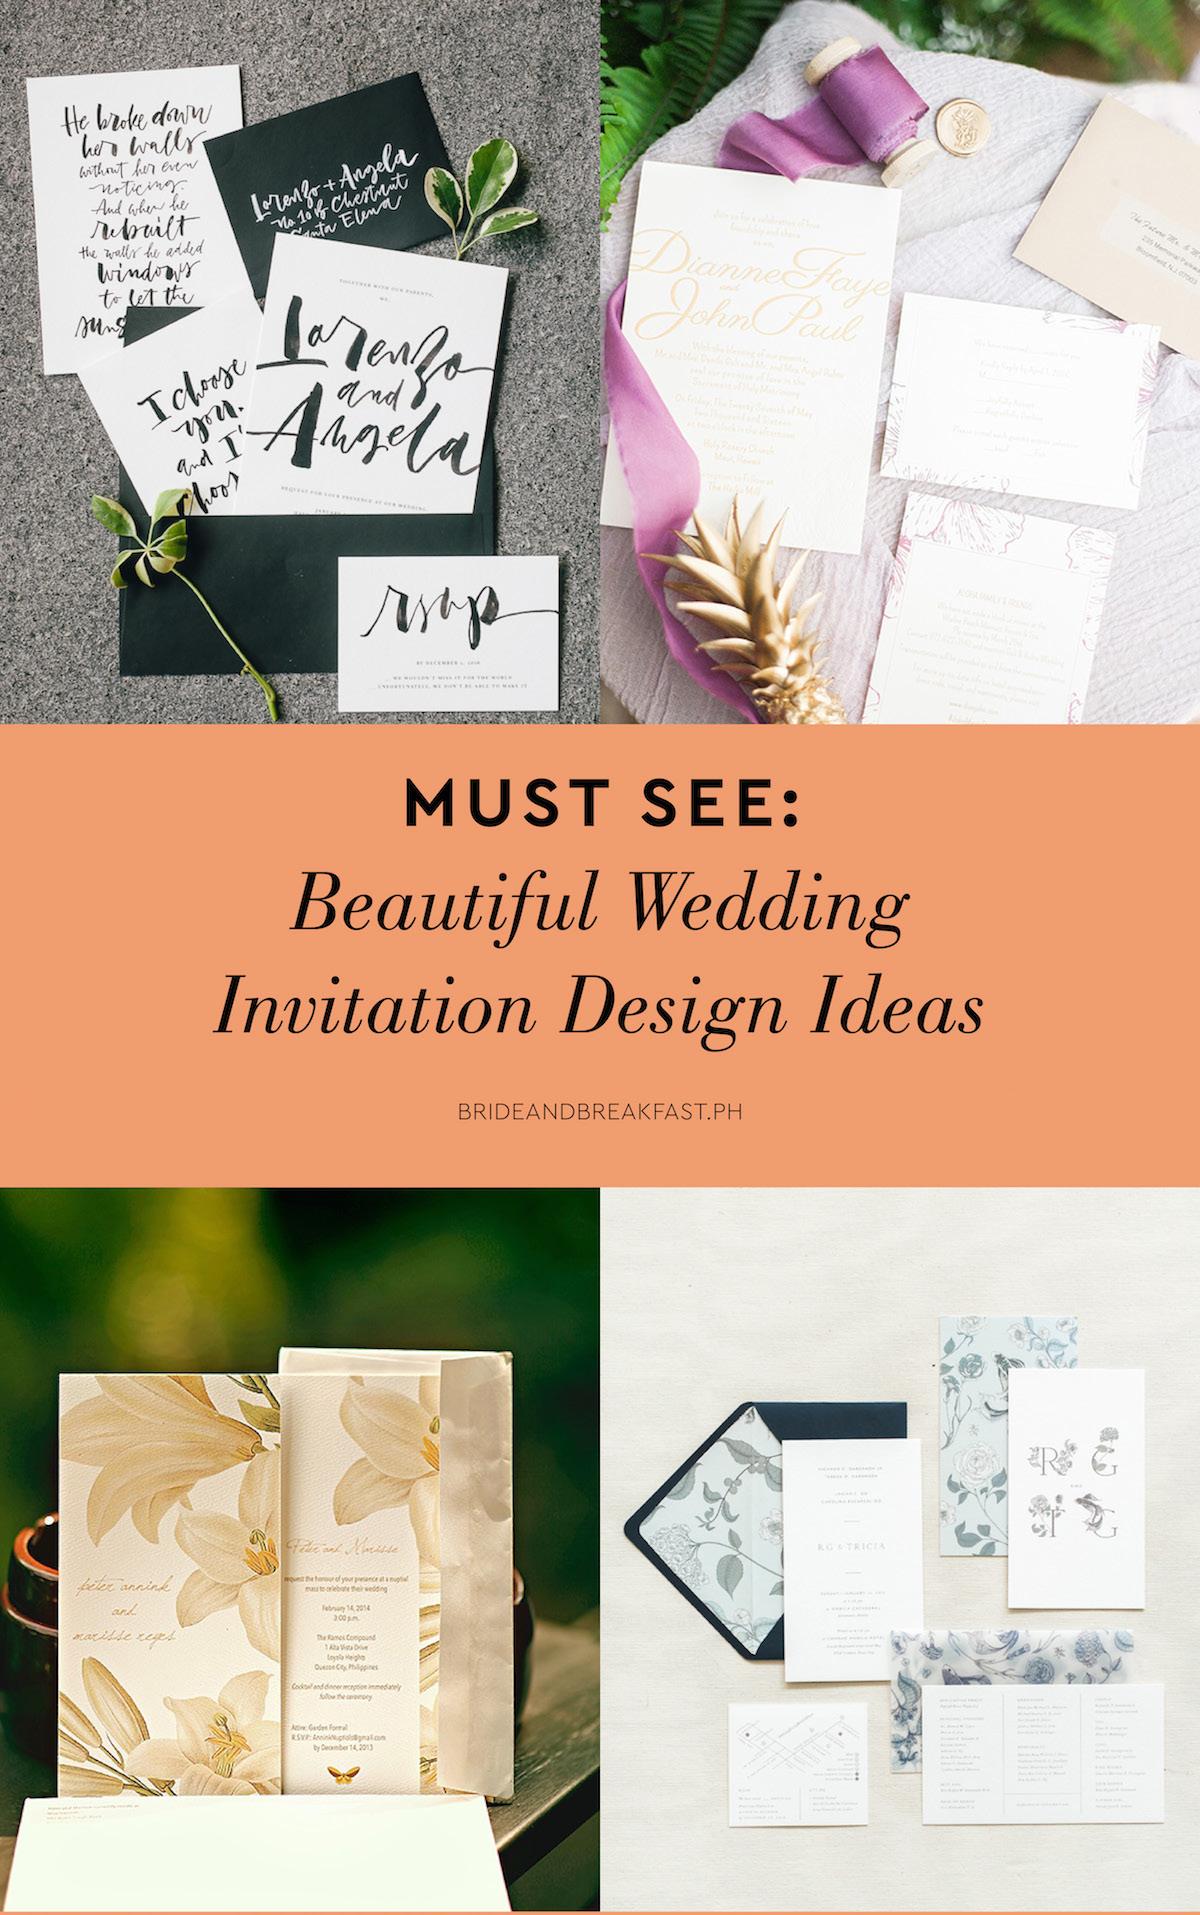 Must See: Beautiful Wedding Invitation Design Ideas